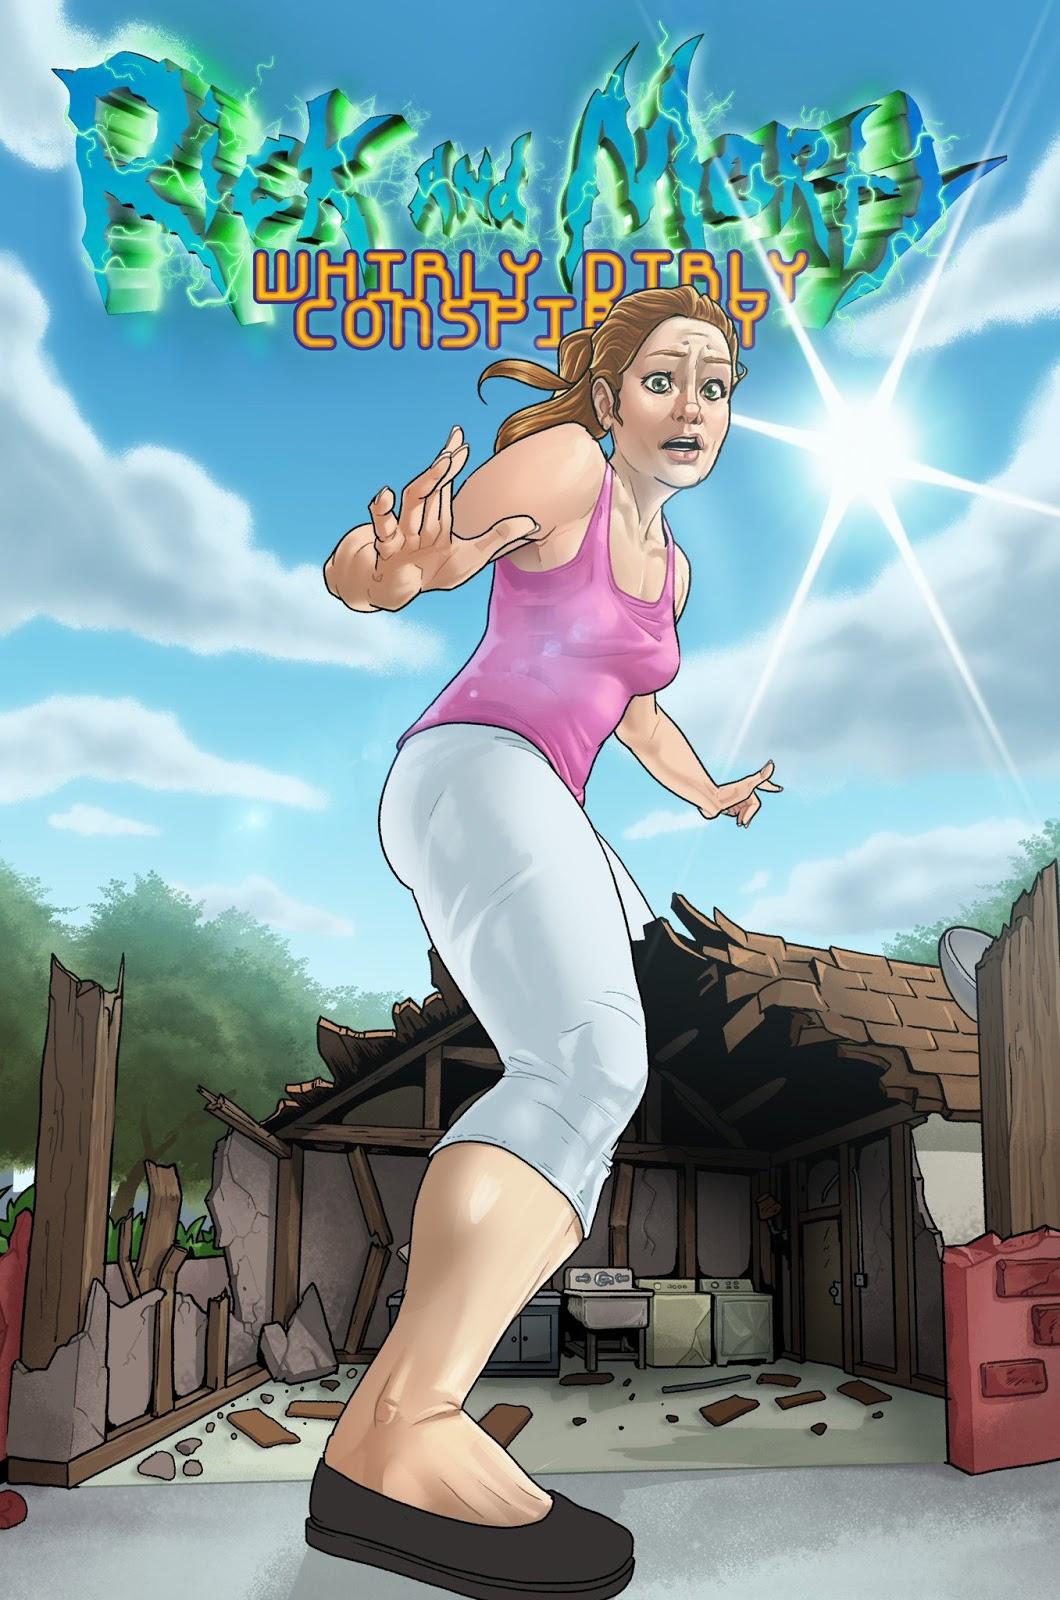 Revenge of the Giantess: Rick and Morty - Giantess Summer